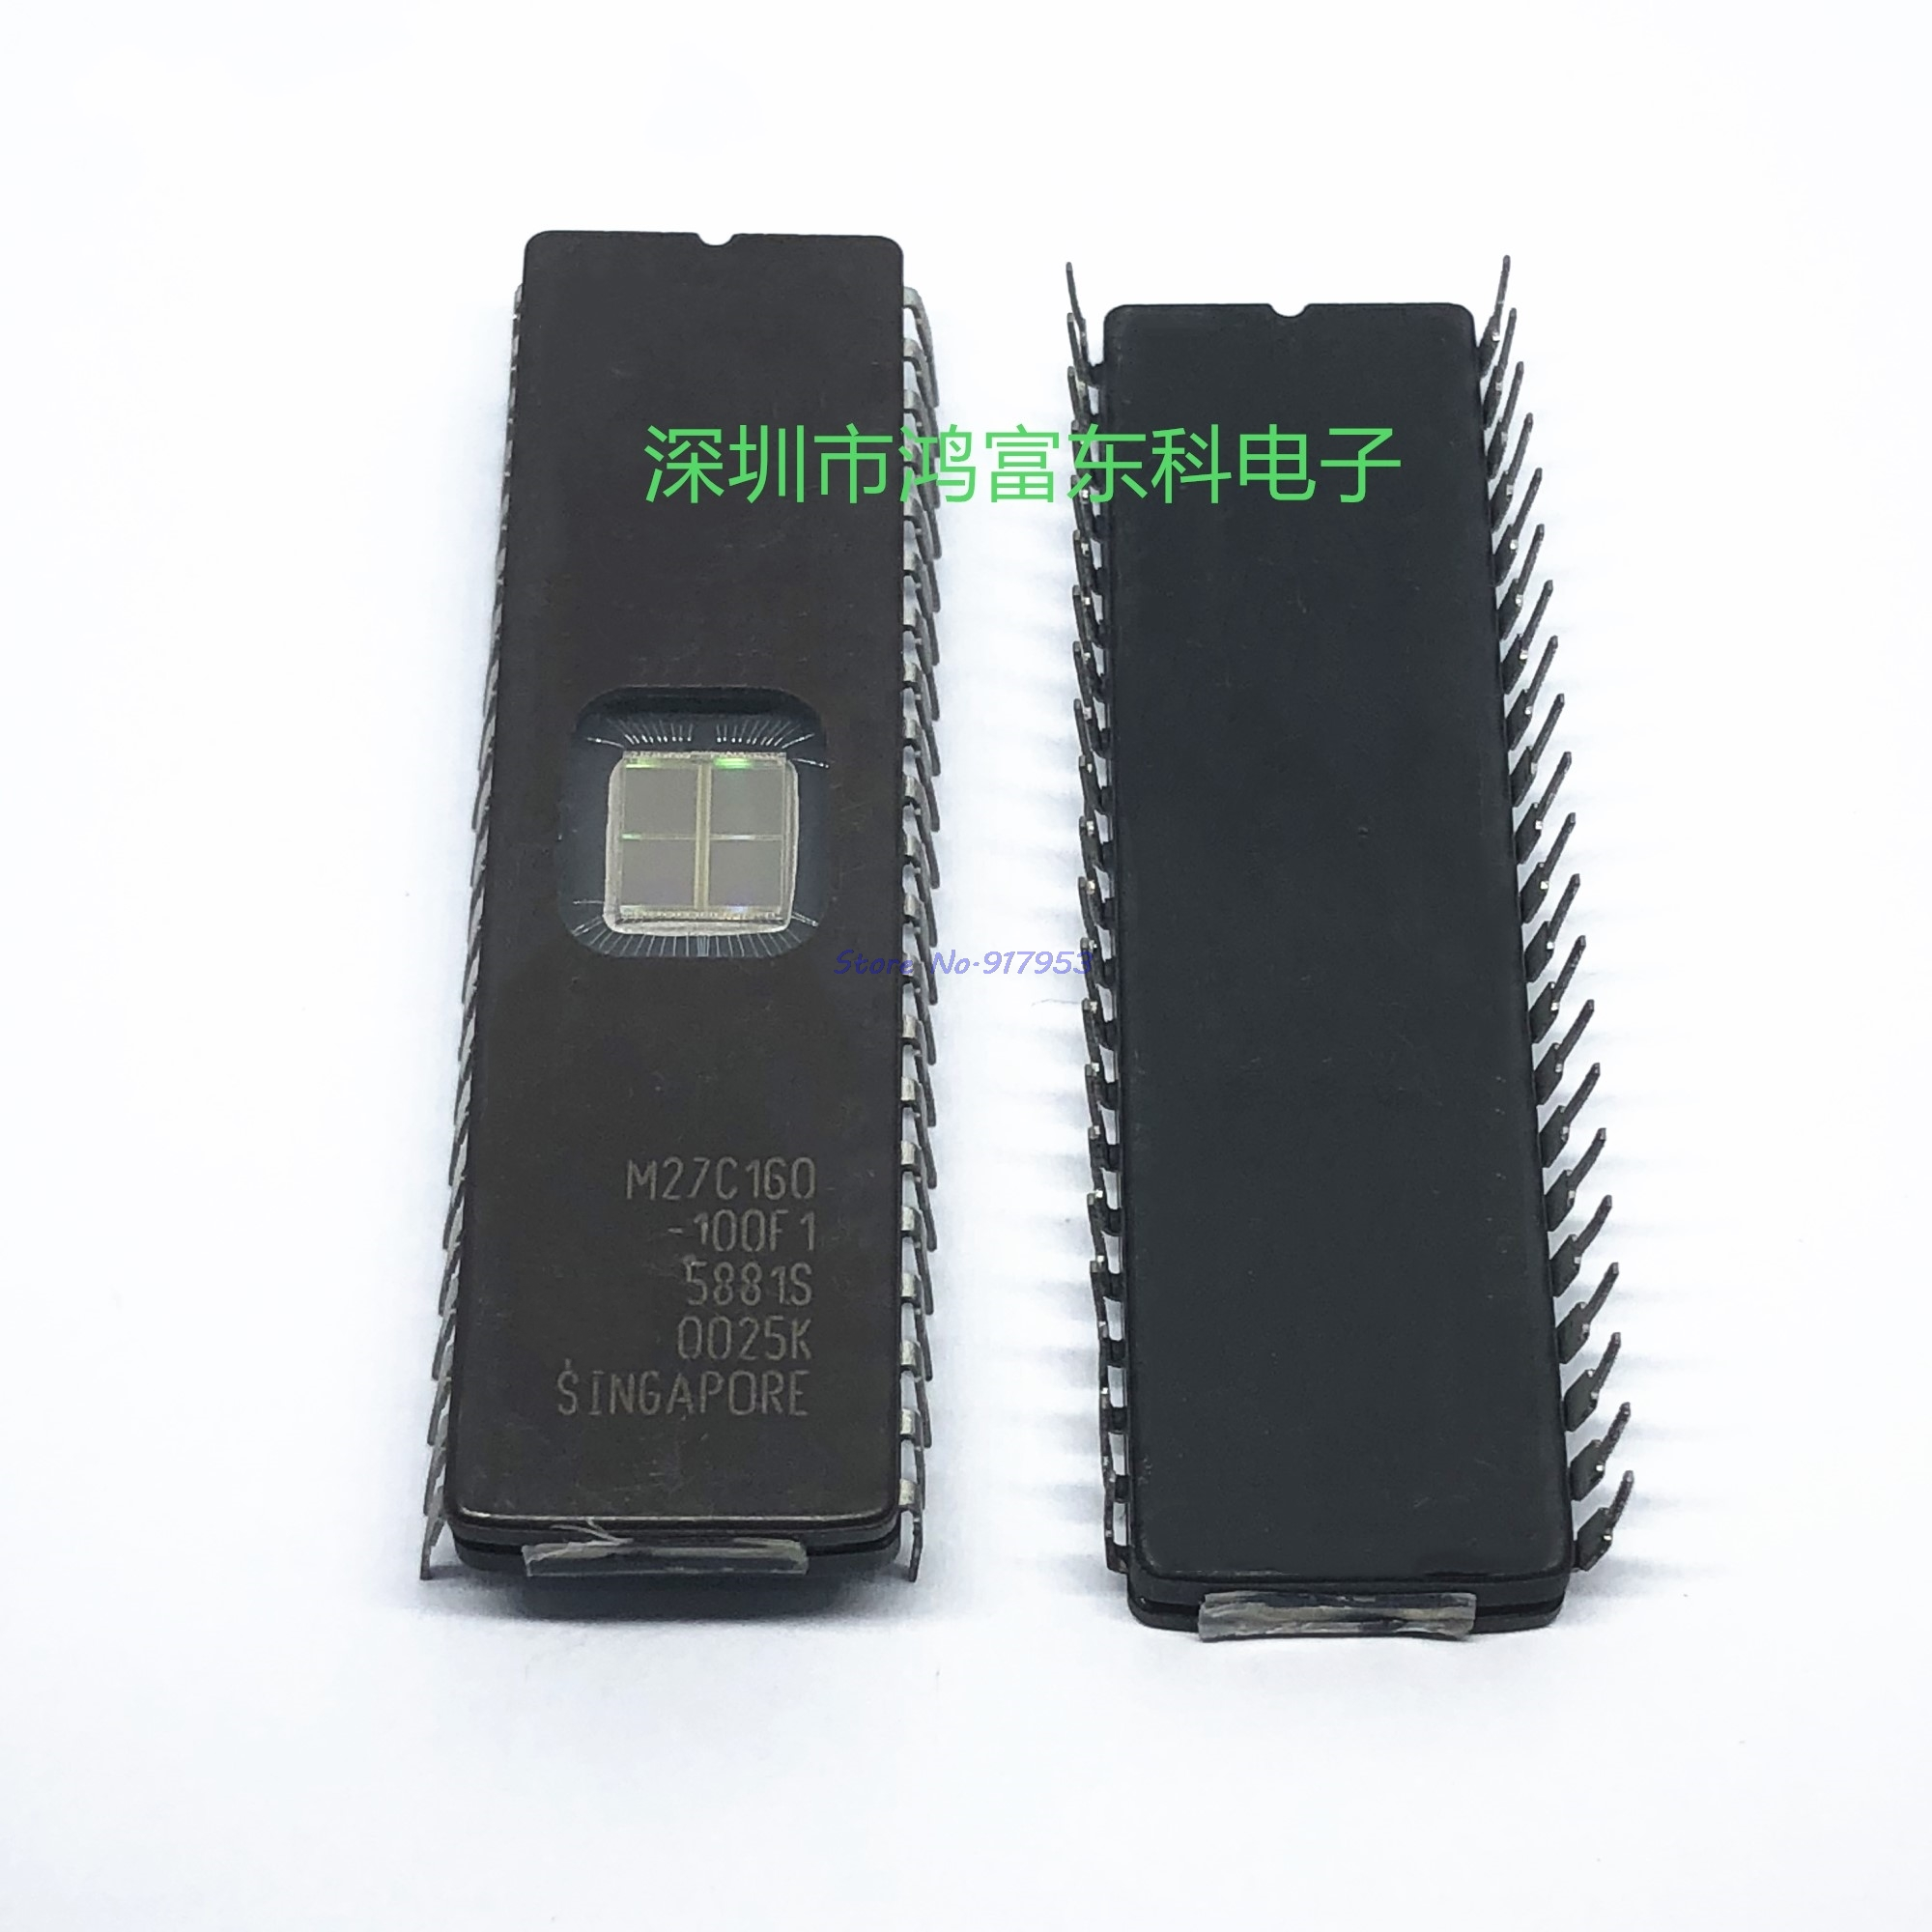 1PCS//5PCS//10PCS M27C160-100F1 M27C160 DIP-42 4EPROM UV 16MBIT 100NS BULK ST